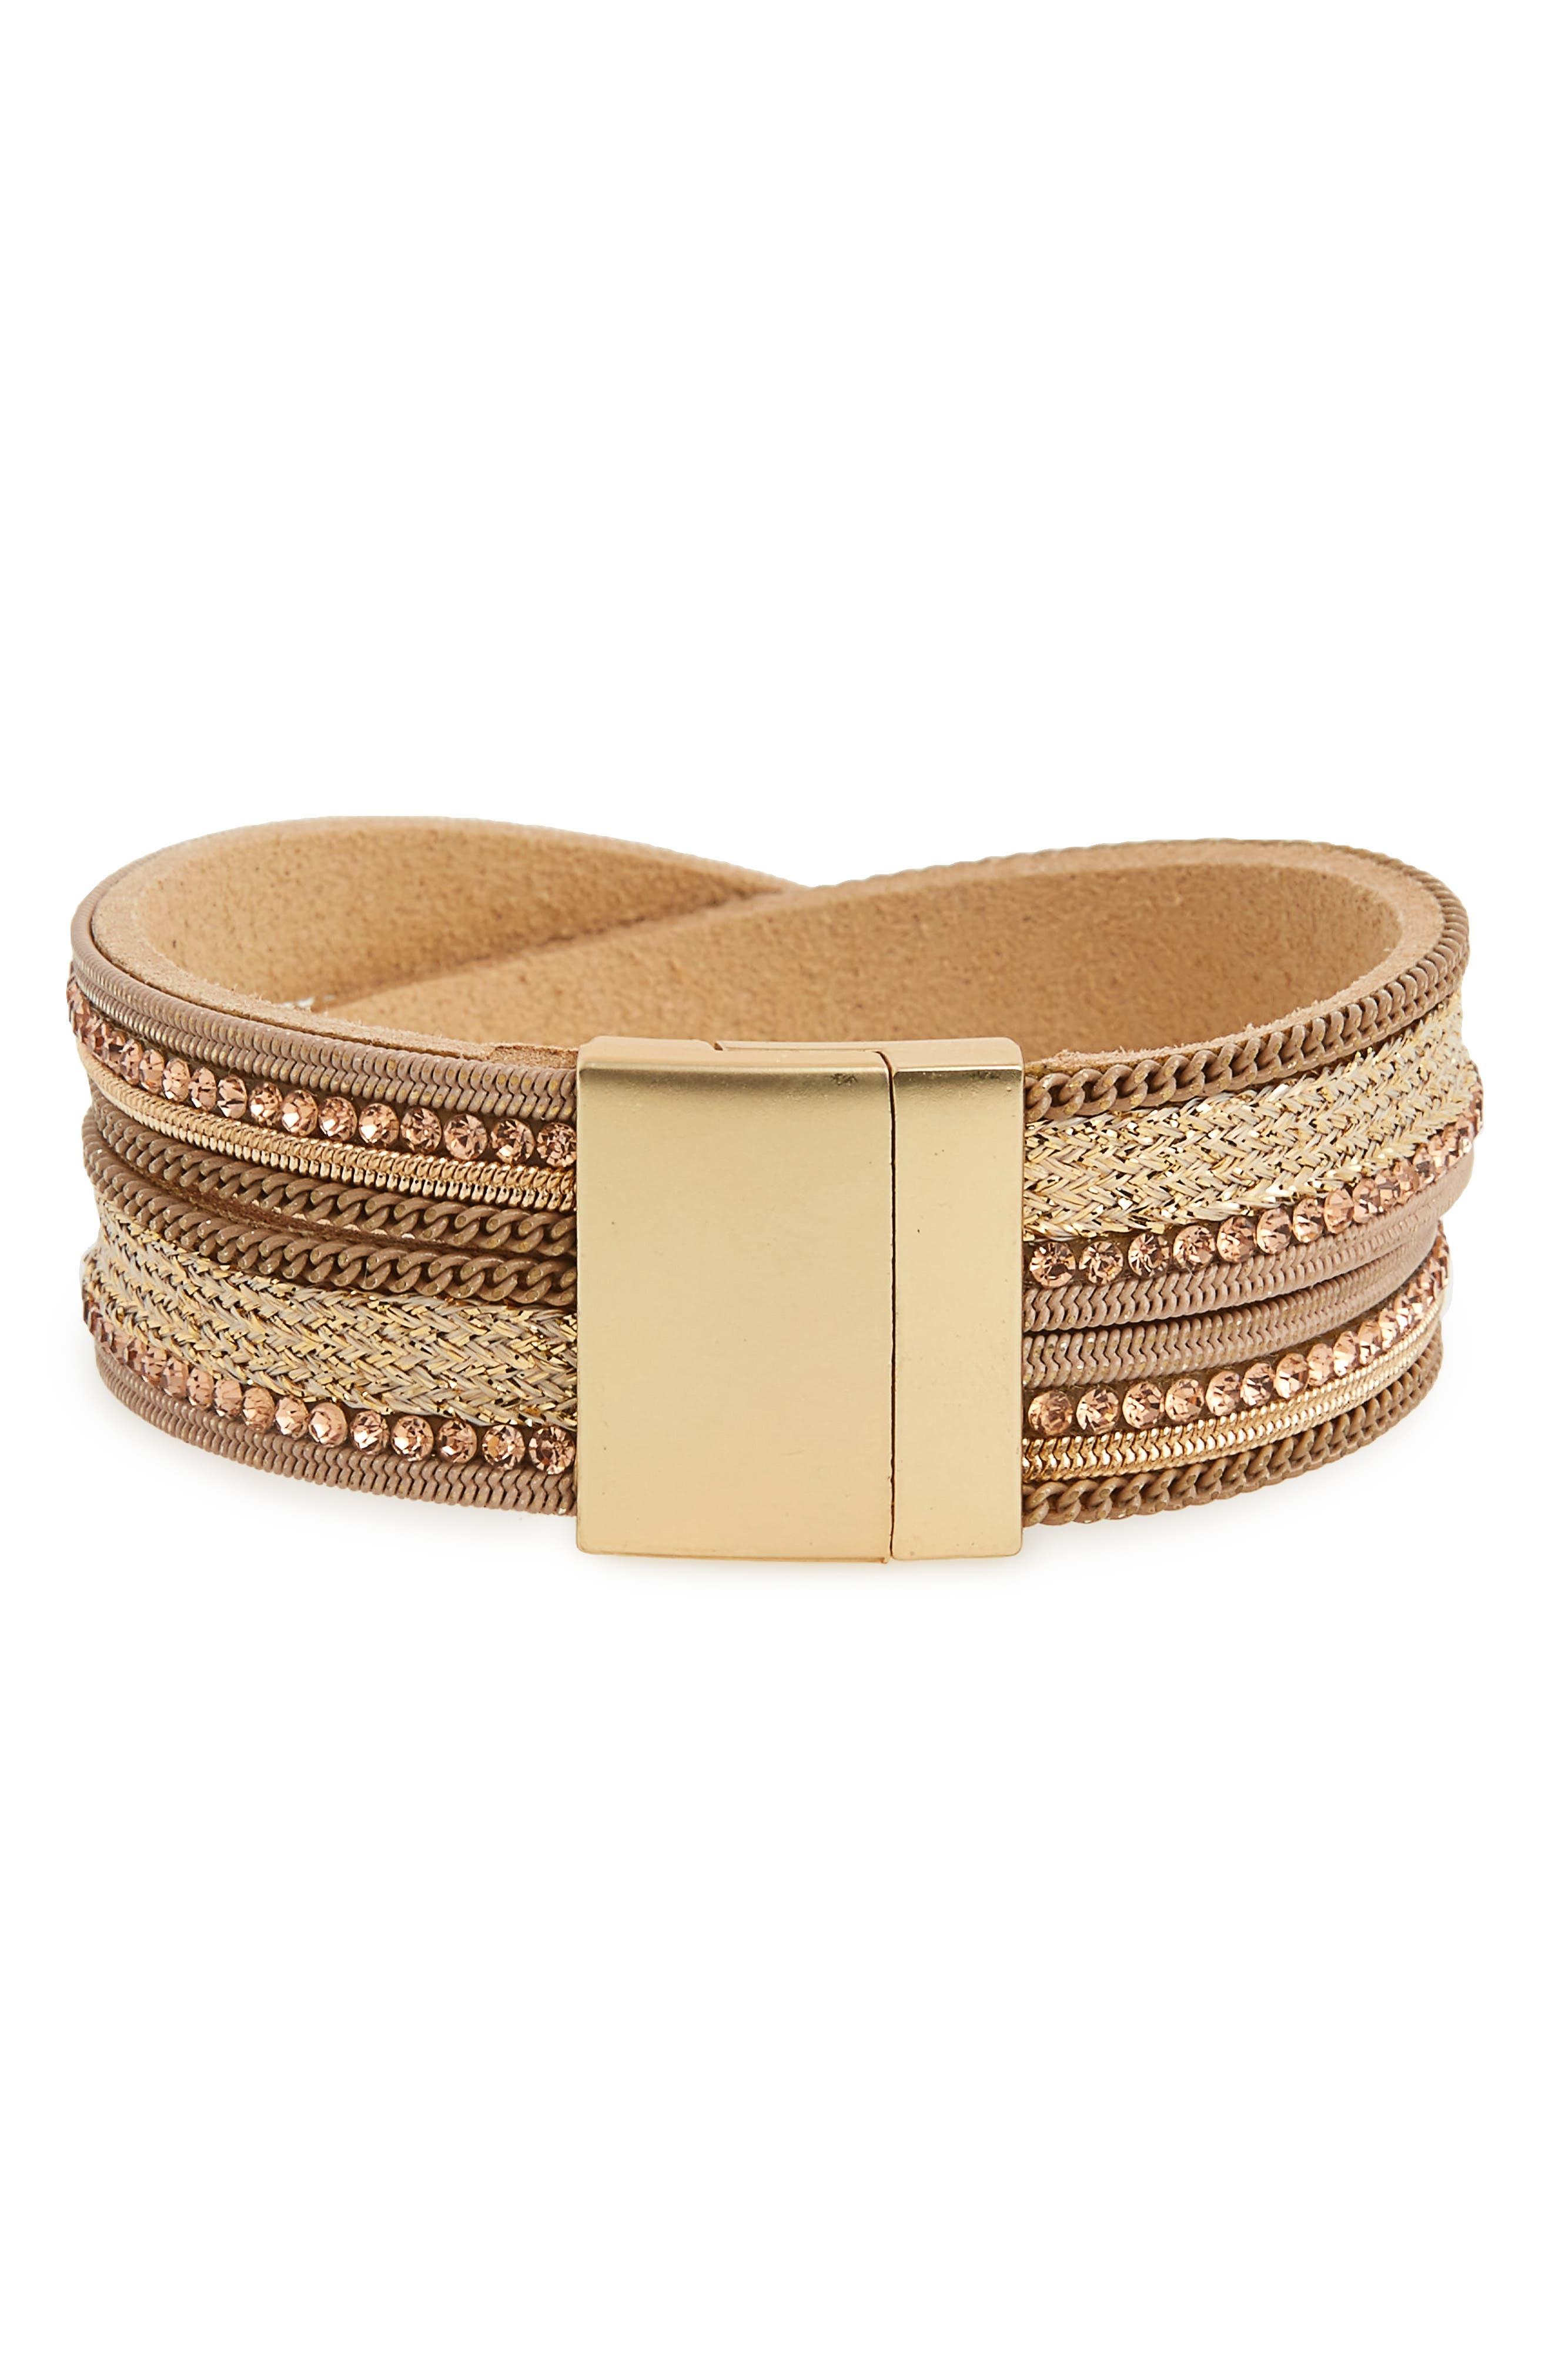 PANACEA Crisscross Bracelet